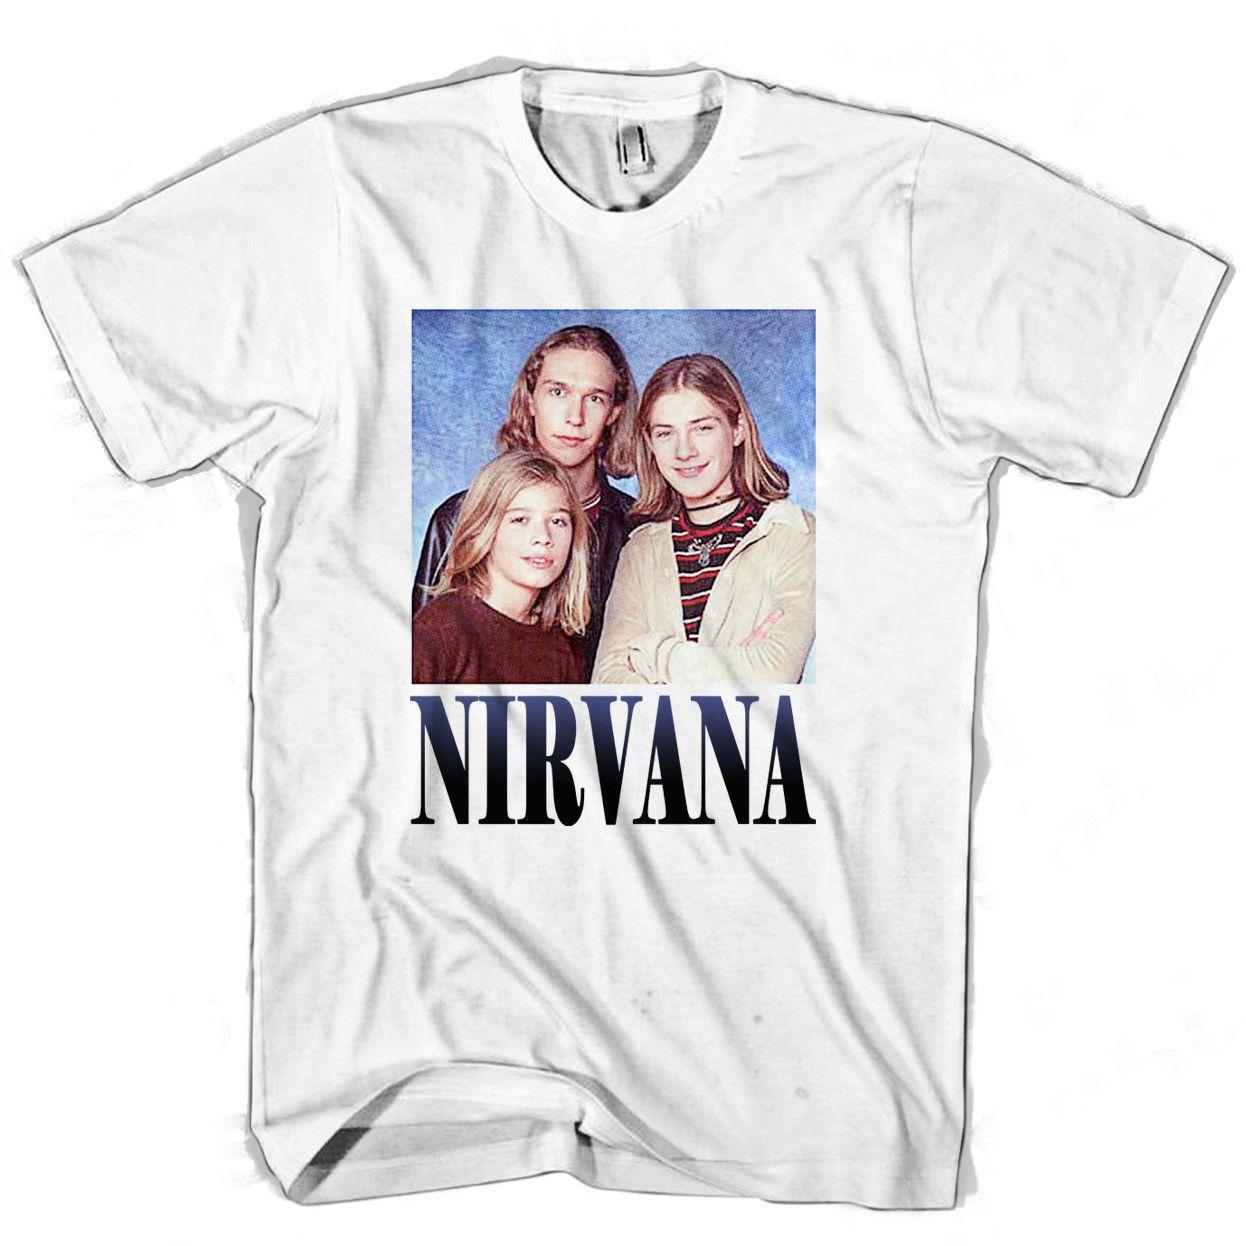 c4cb1e20 Nirvana Hanson Men's / Women's T Shirt Funny free shipping Unisex Casual  Tshirt top